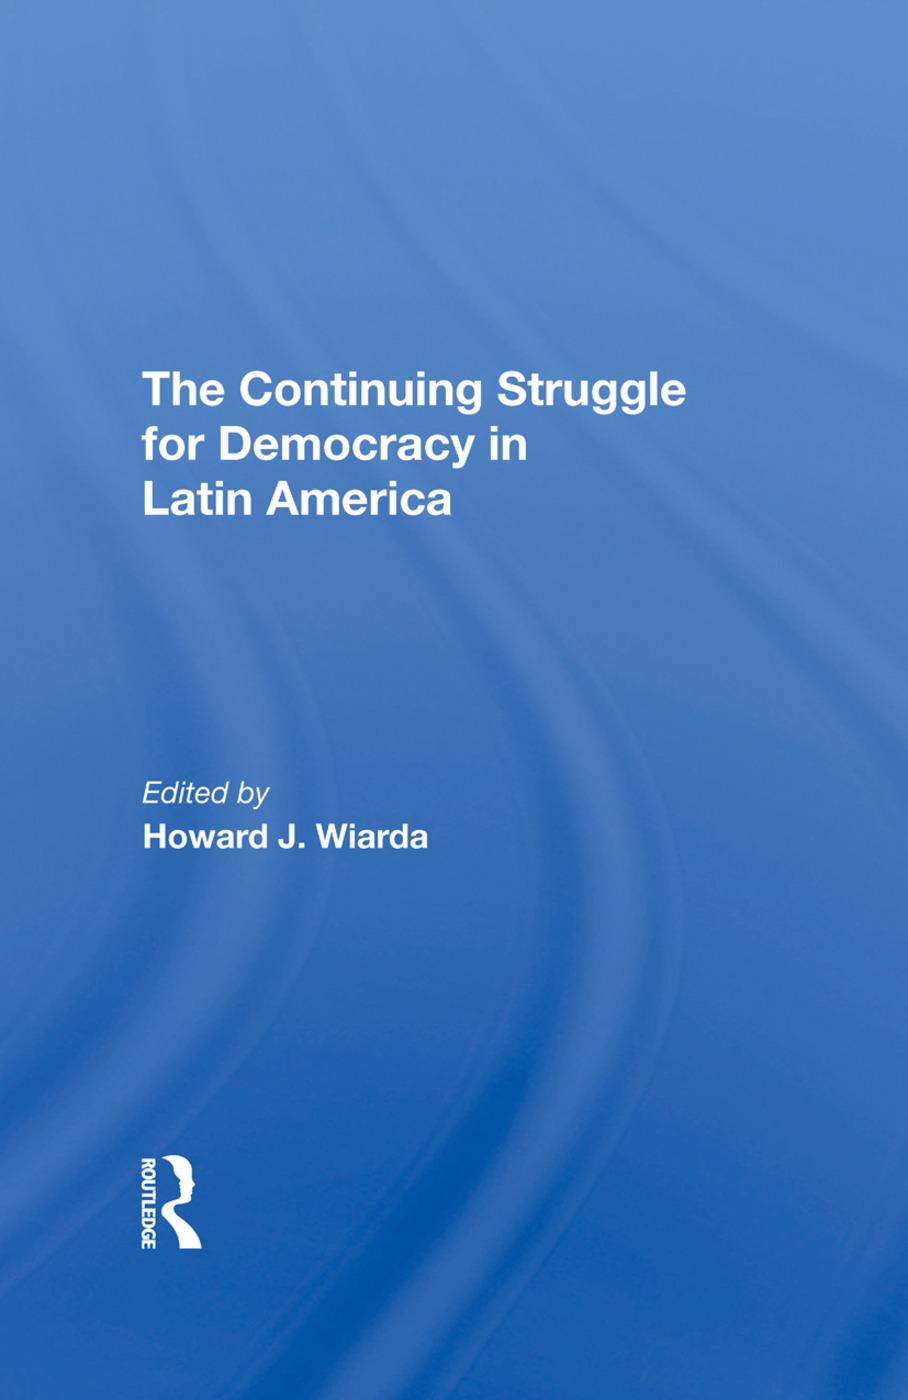 The Continuing Struggle for Democracy in Latin America